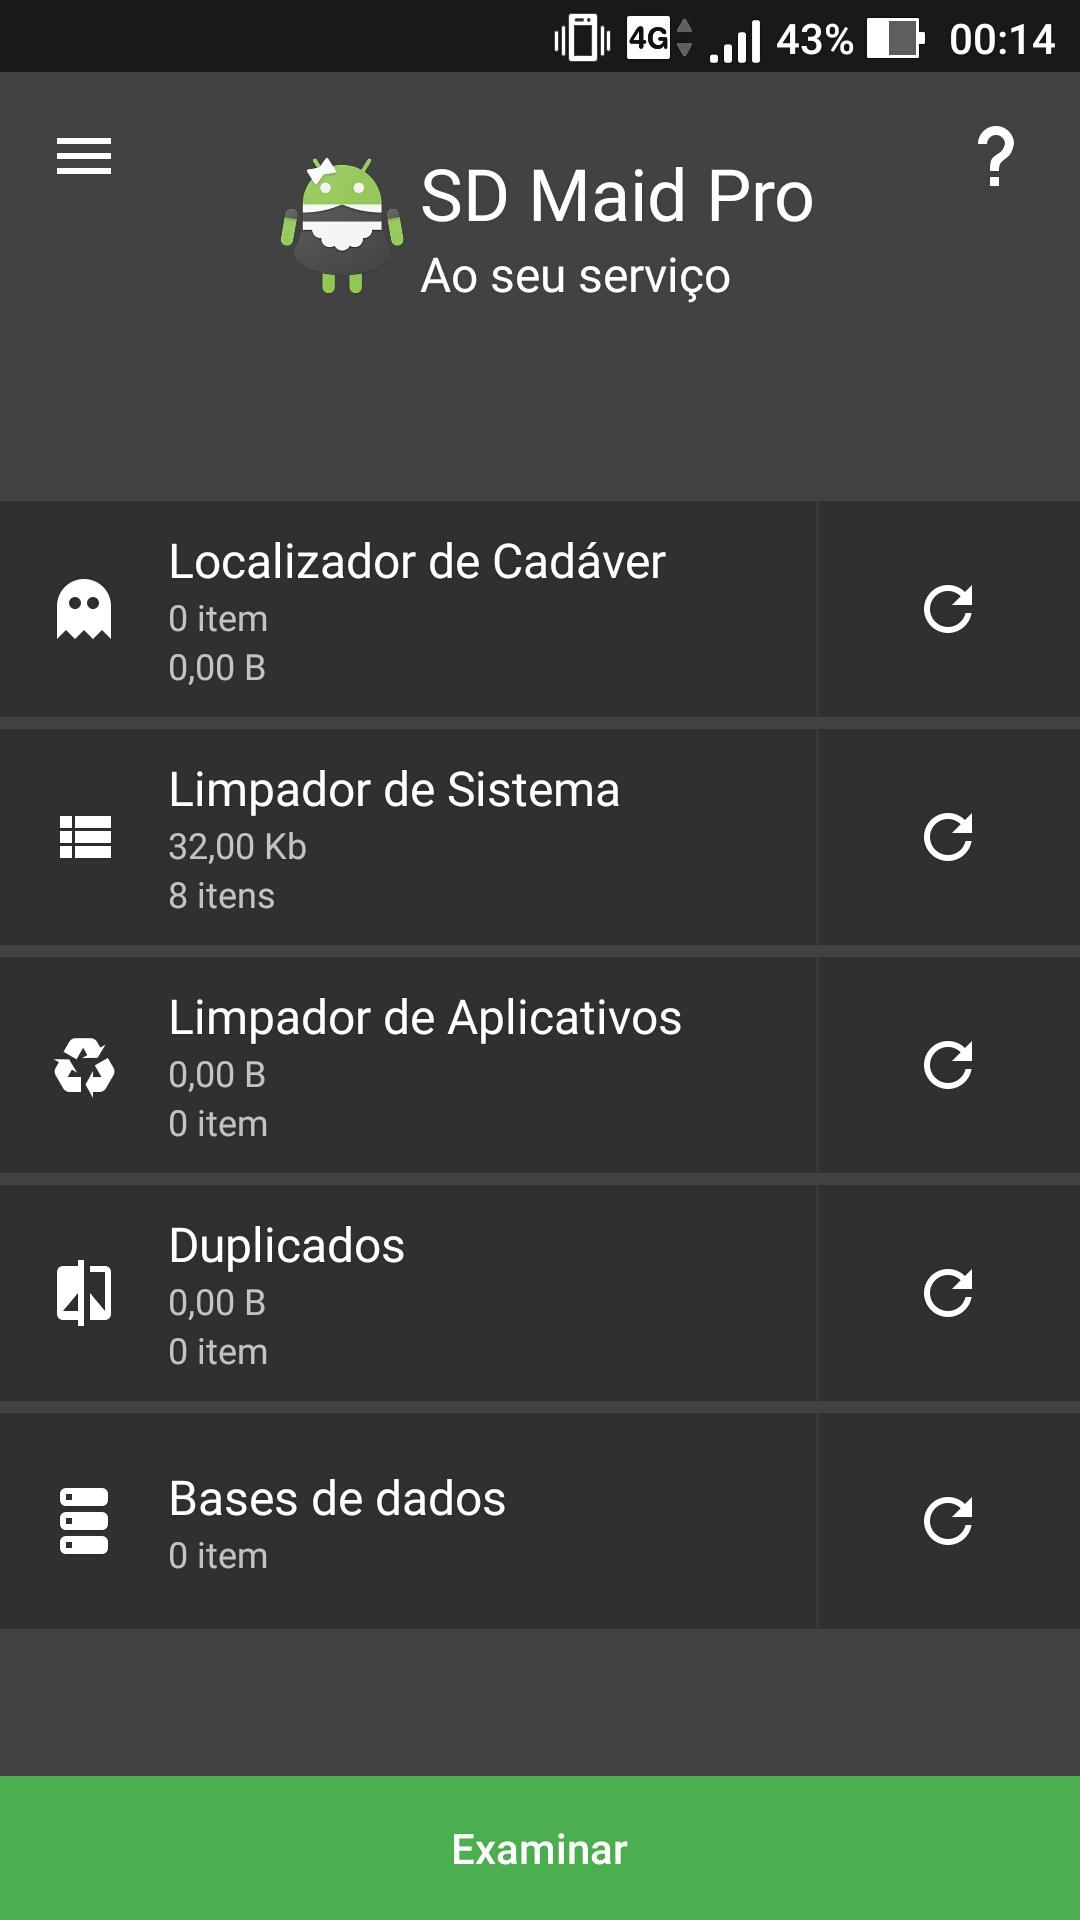 screenshot_20171102-001424